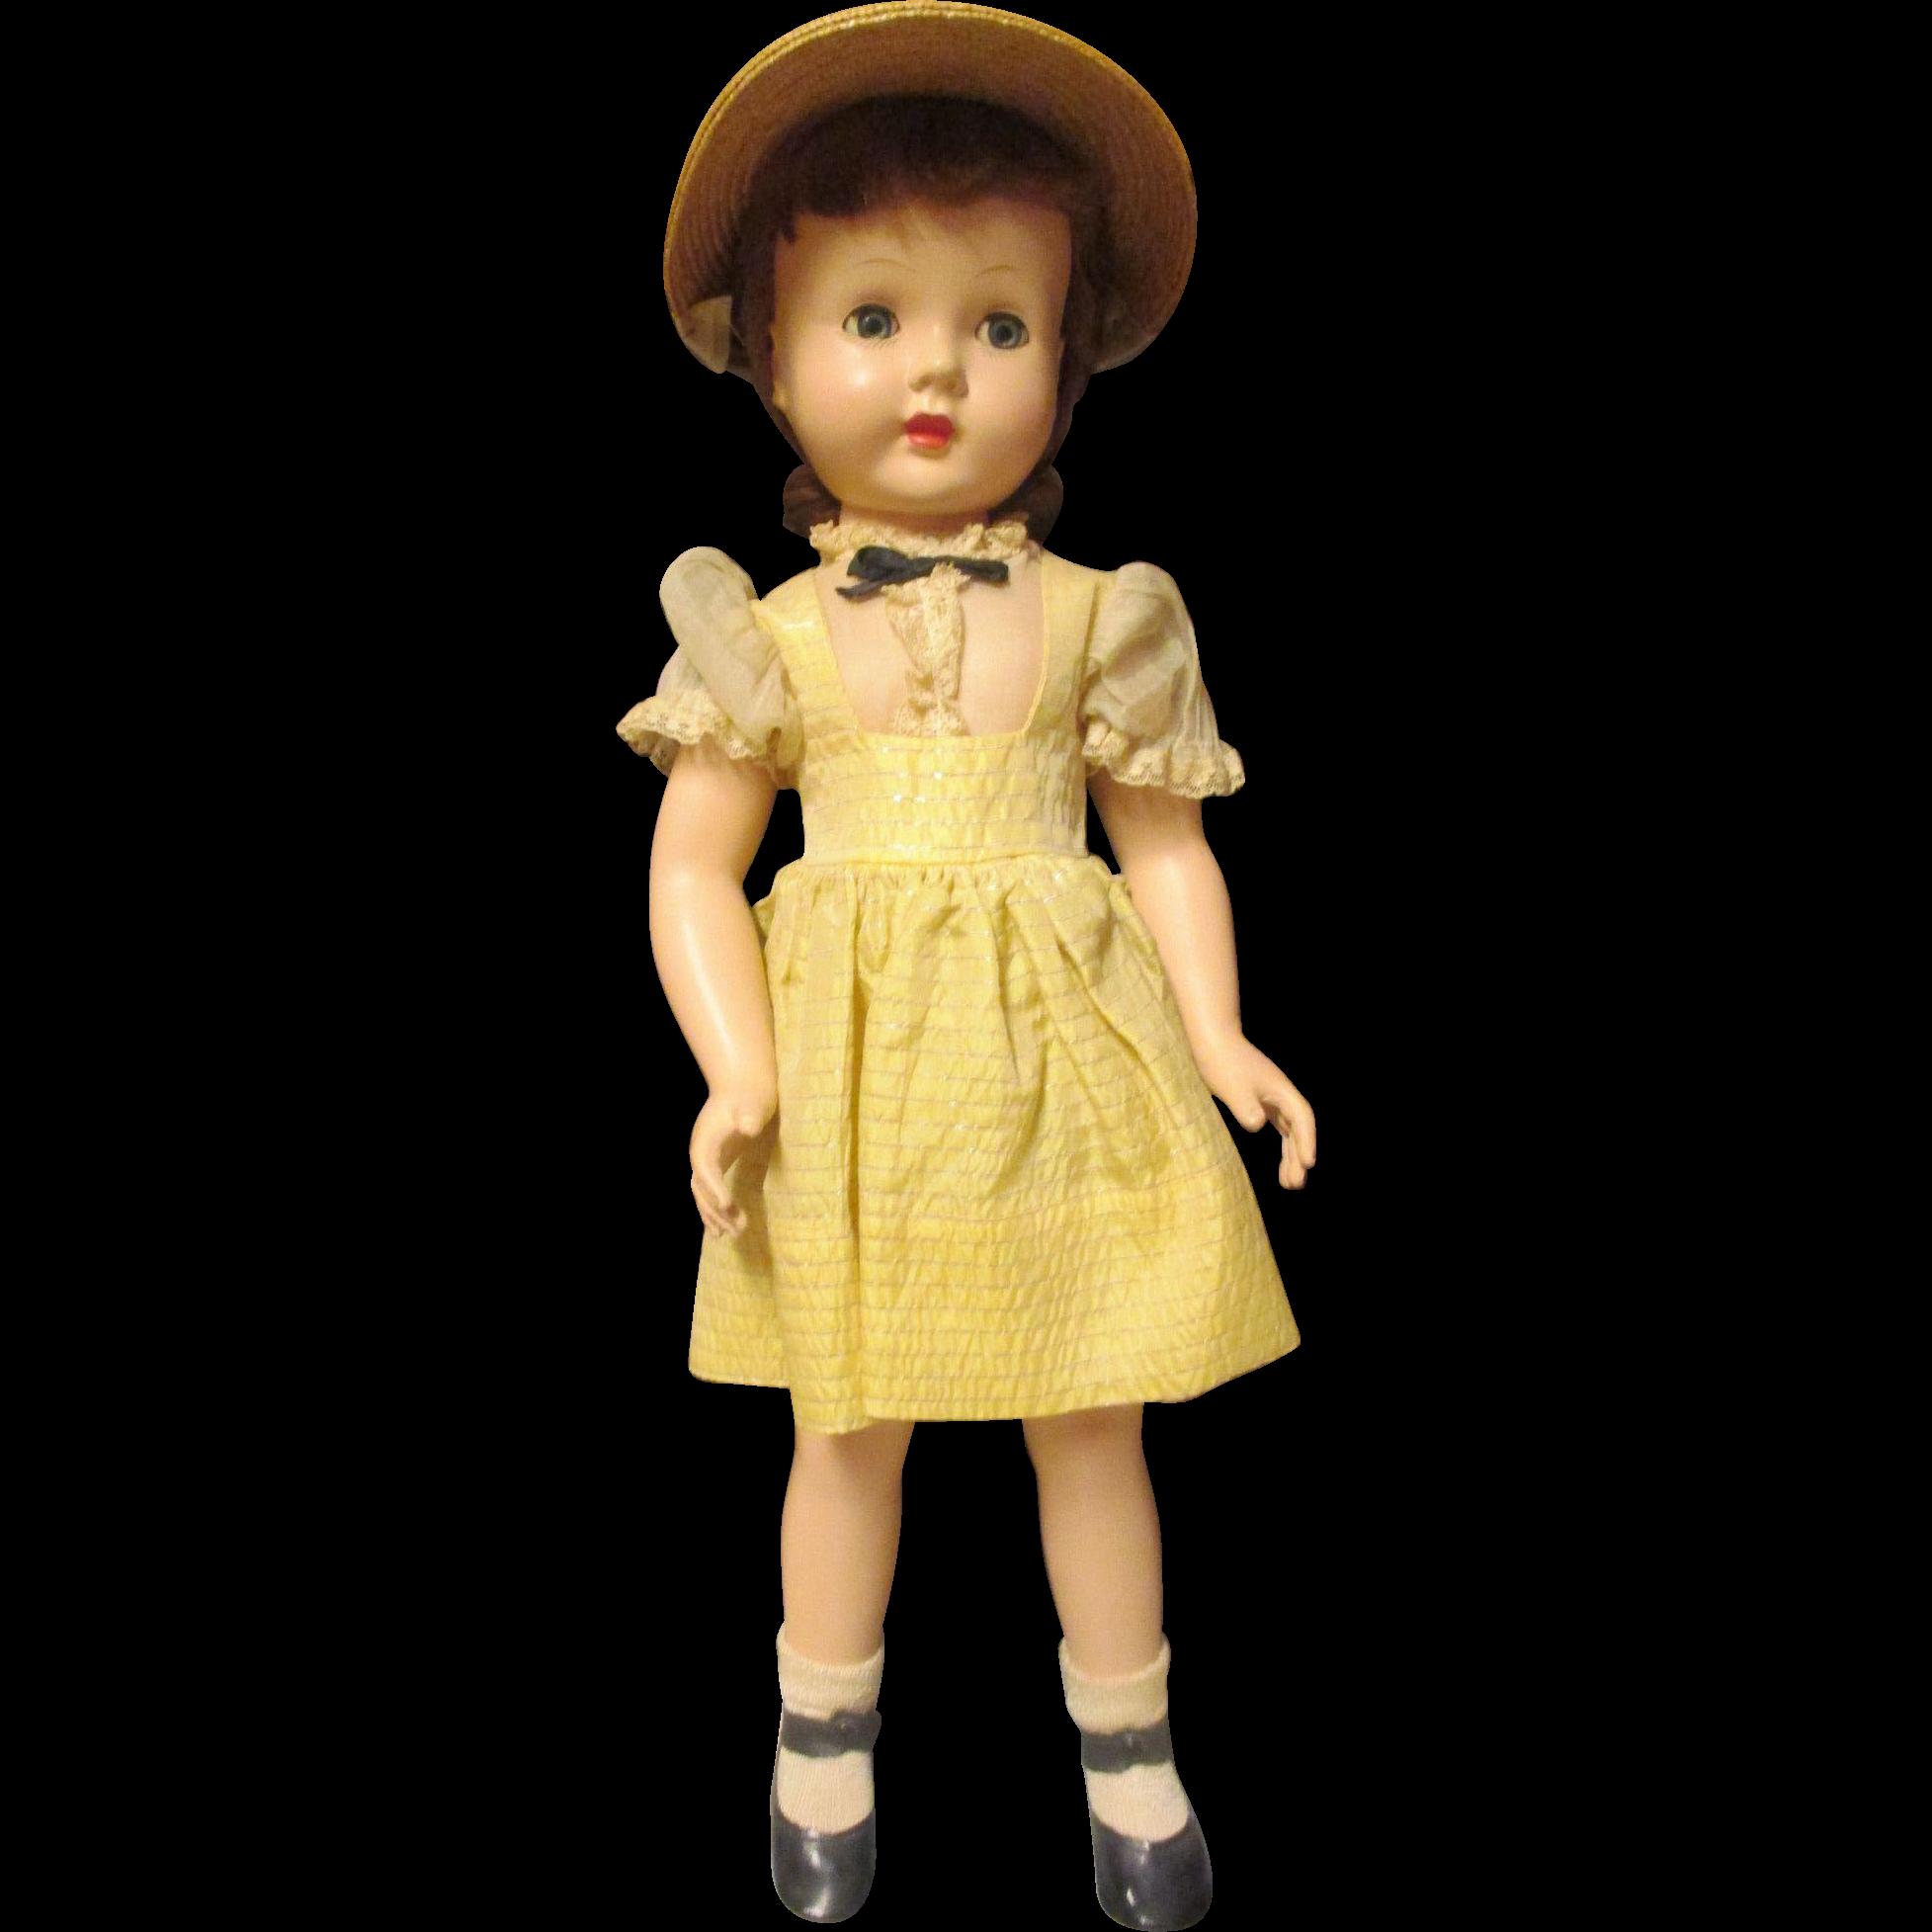 Vintage Effanbee Doll 1950 S From Lea Katjewelsandmore On